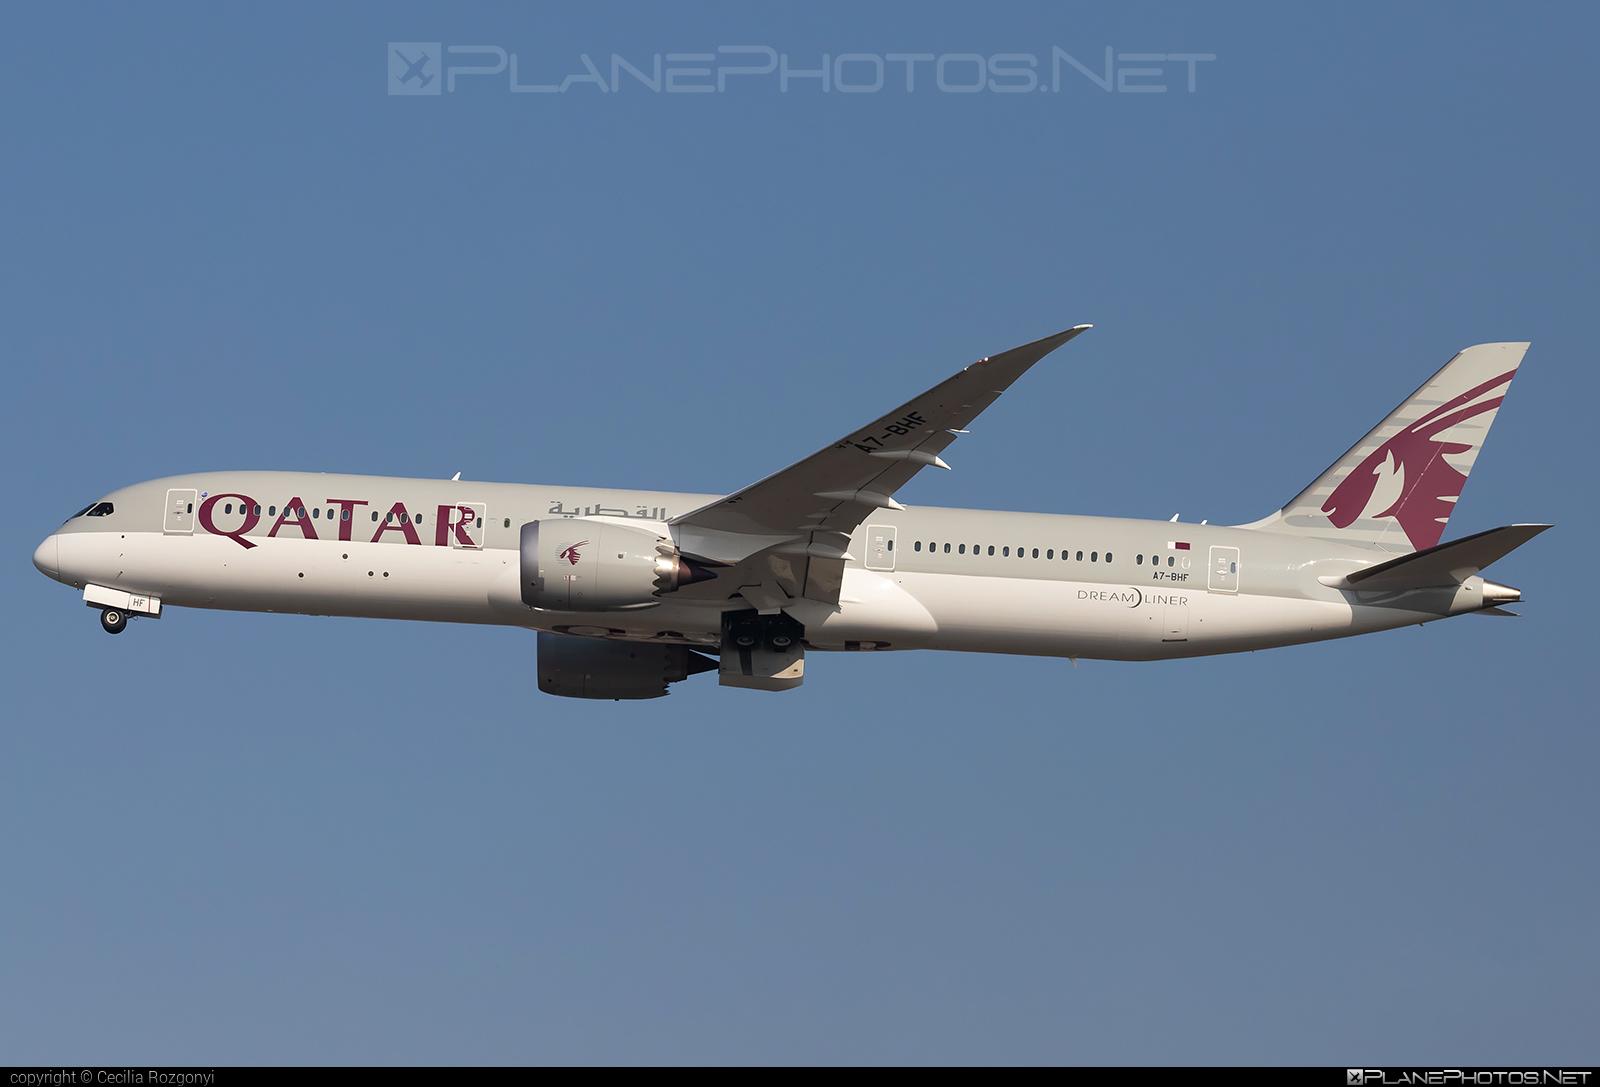 Boeing 787-9 Dreamliner - A7-BHF operated by Qatar Airways #b787 #boeing #boeing787 #dreamliner #qatarairways